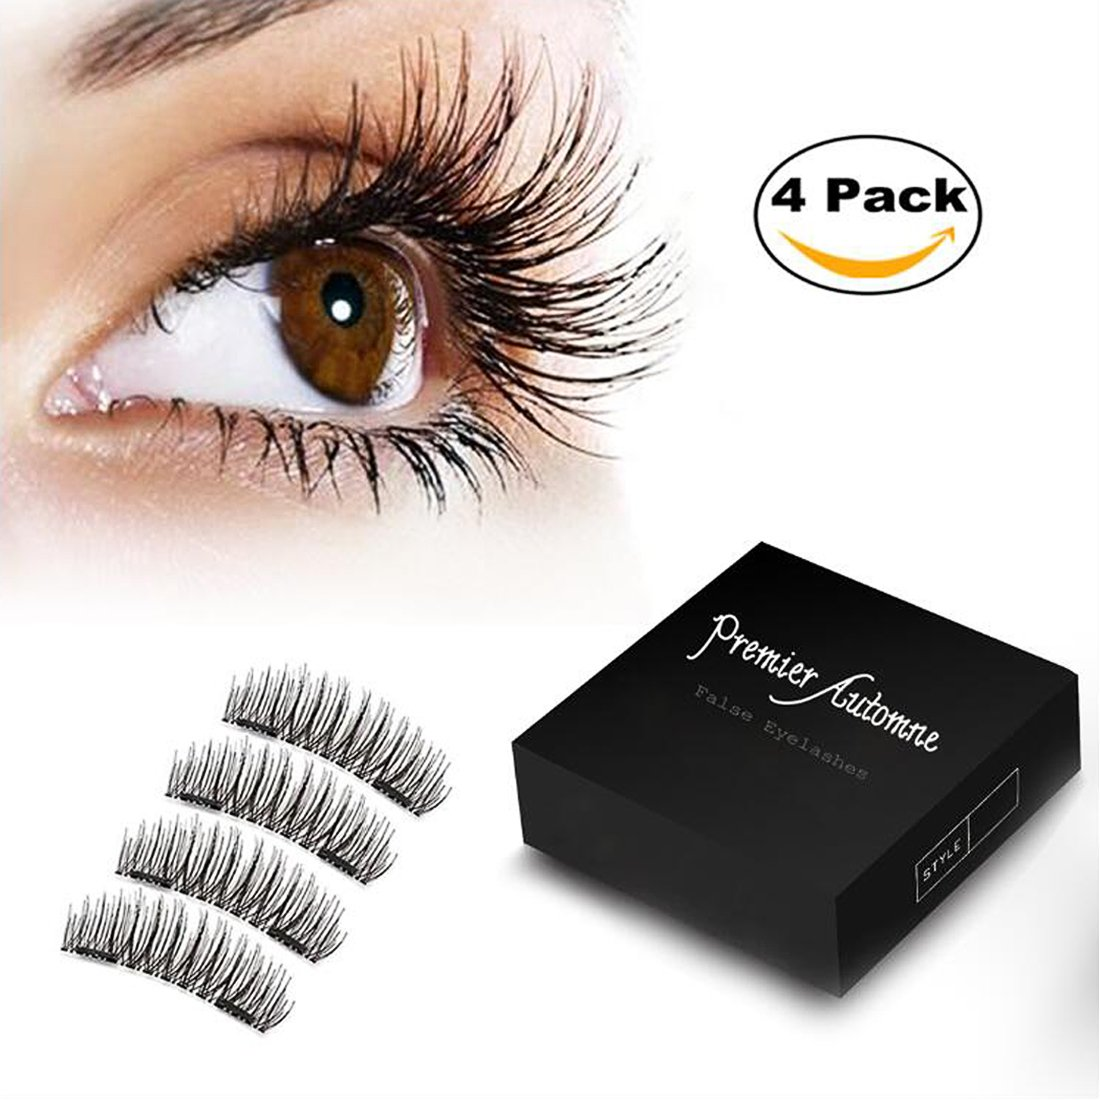 051897ea92f Amazon.com : Premier Automne Magnetic False Eyelashes Reusable Magnet Quality  Eyelashes Extensions Set 1 Pair/4Pcs : Beauty